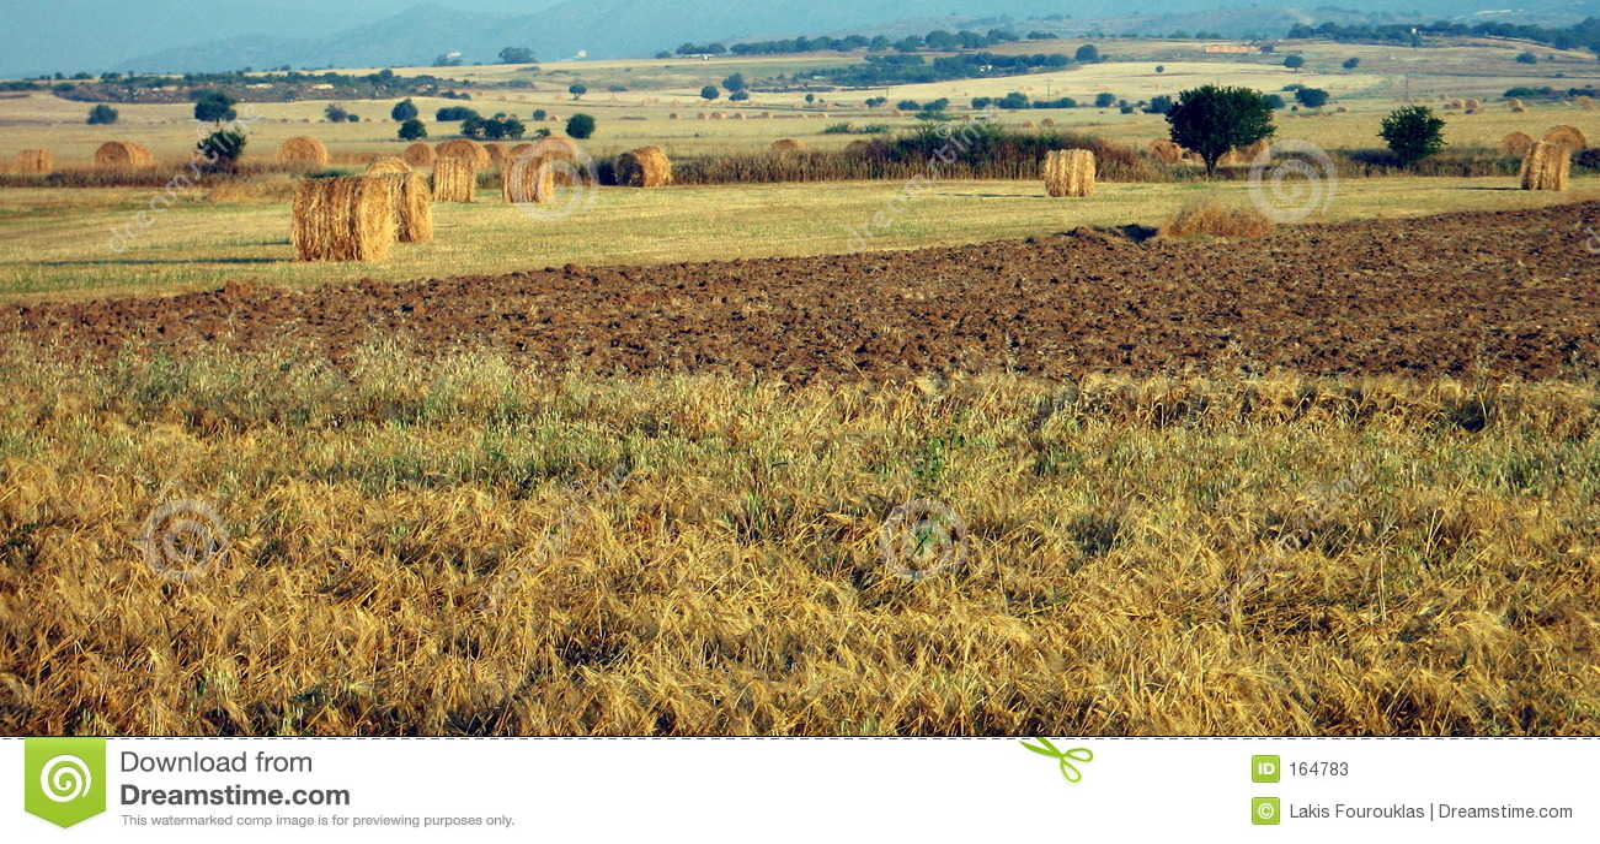 Fields panorama